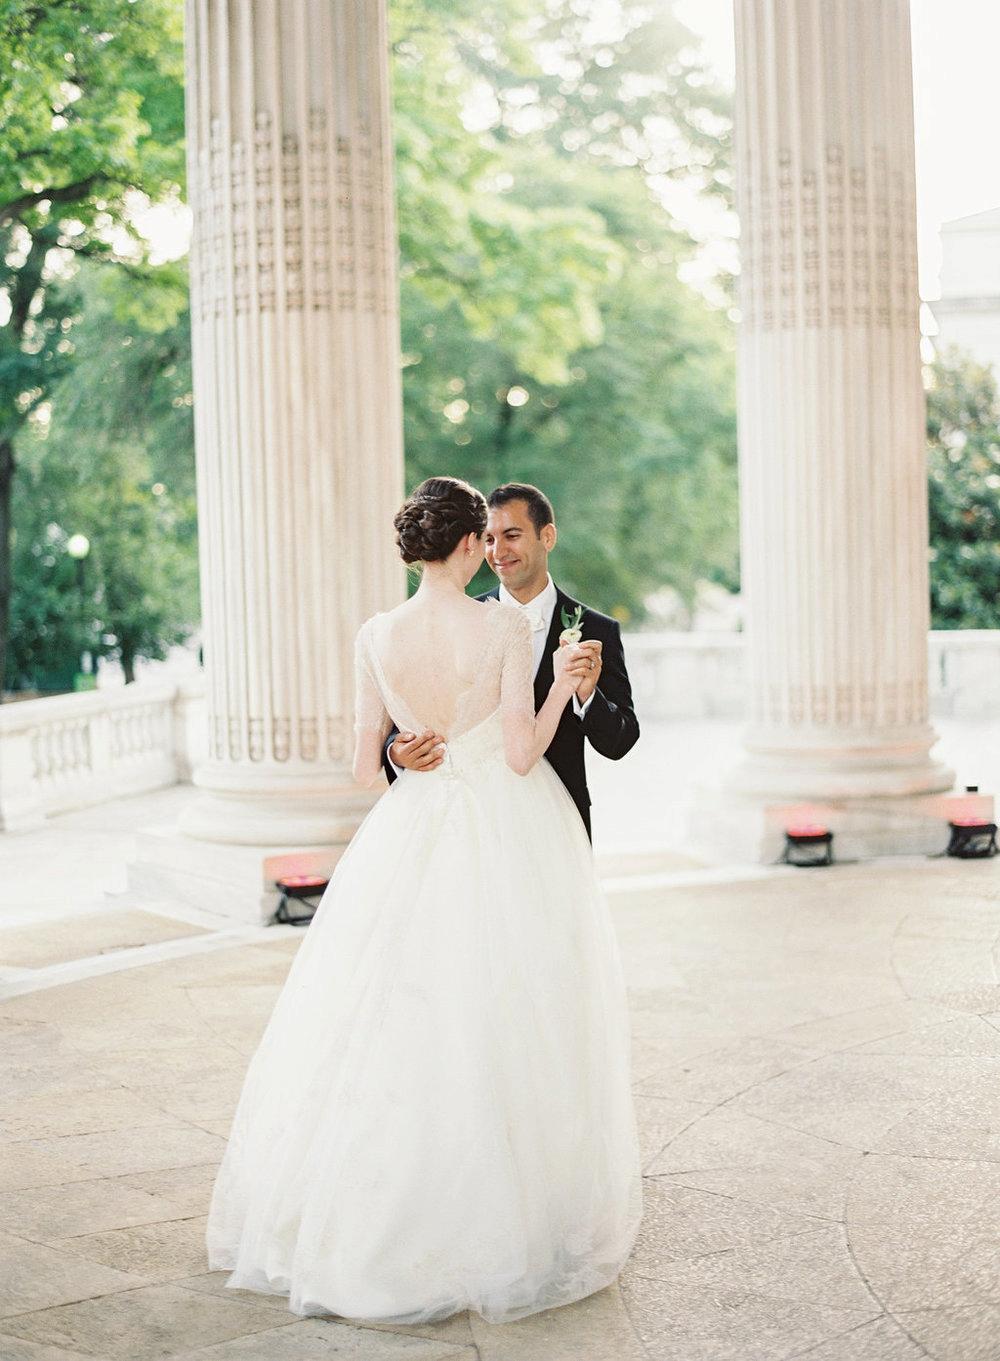 Vicki Grafton Photography - Fine Art DC Virginia Charlottesville Film Wedding Photographer_0064.jpg